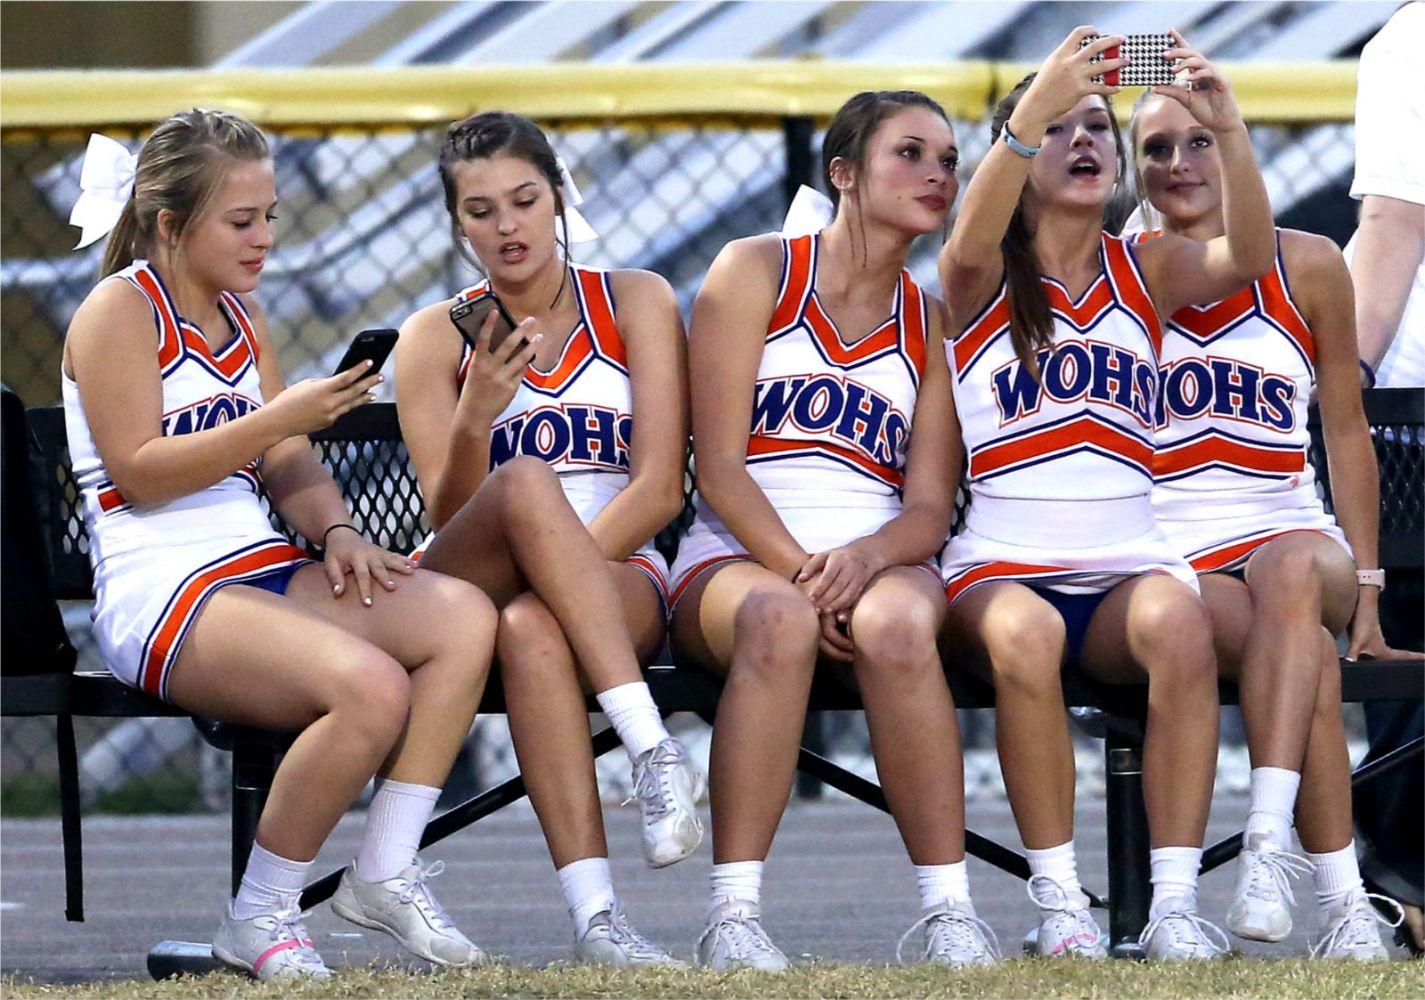 Cheerleaders suck toes